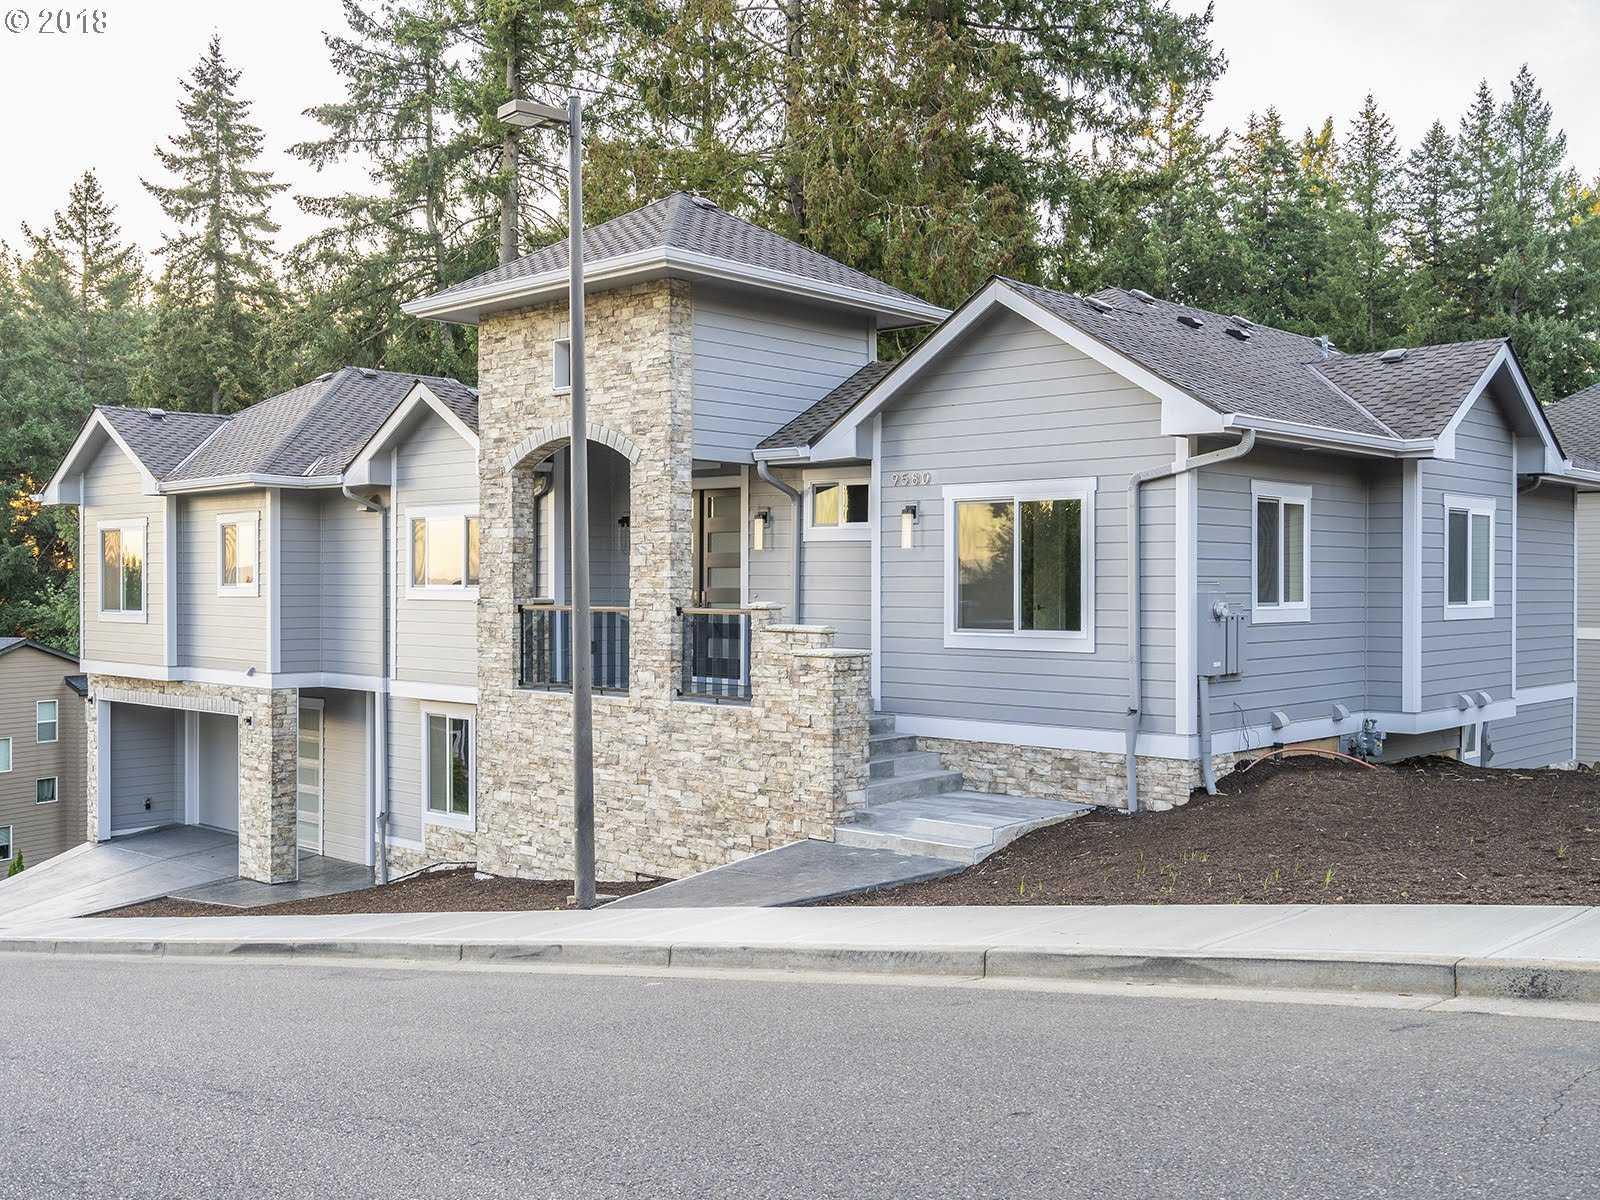 $899,000 - 6Br/5Ba -  for Sale in Beaverton